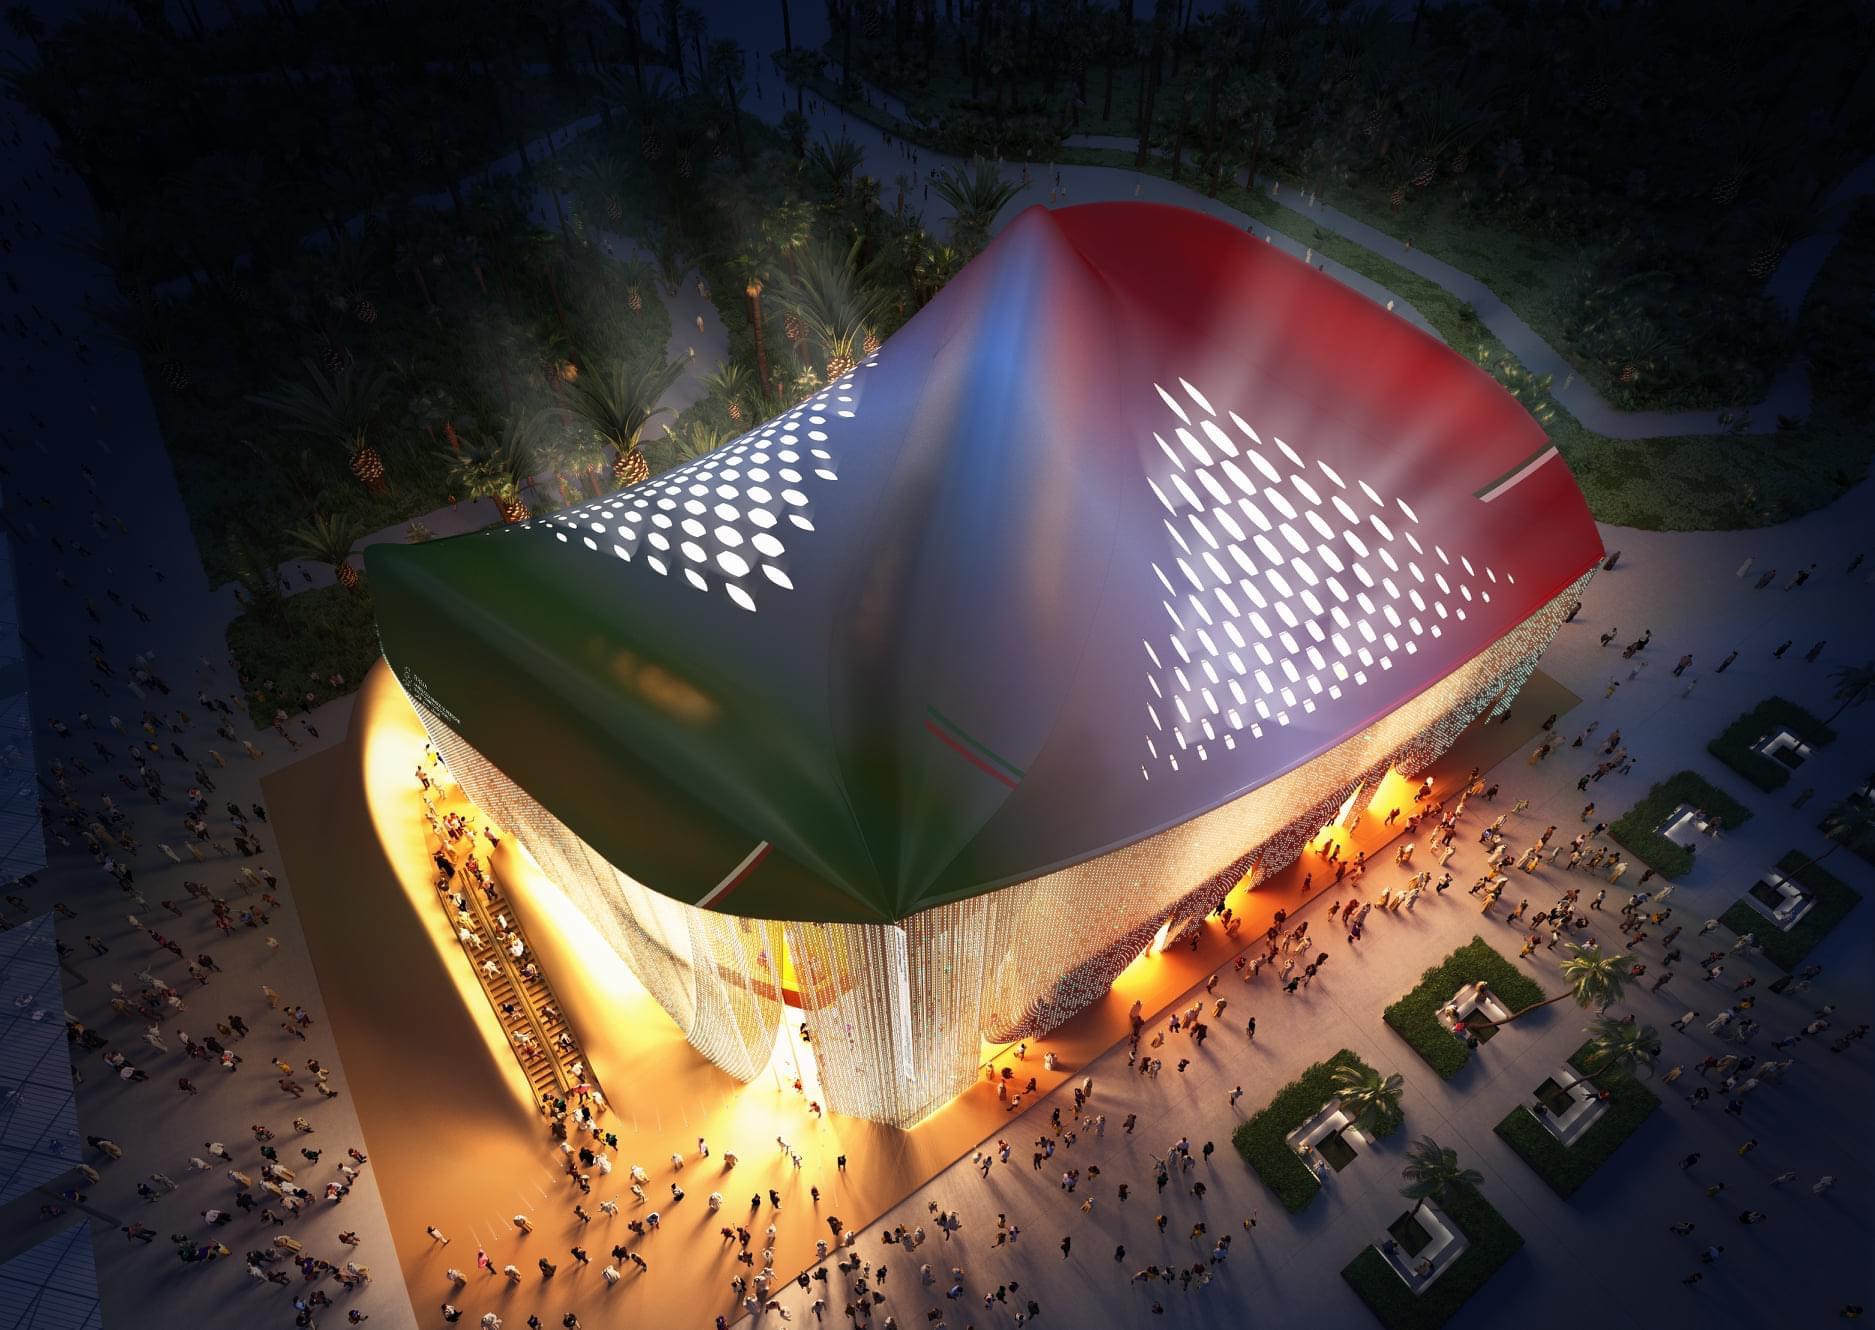 Padiglione-Italia-Expo-Dubai-2021 - spirulina.it